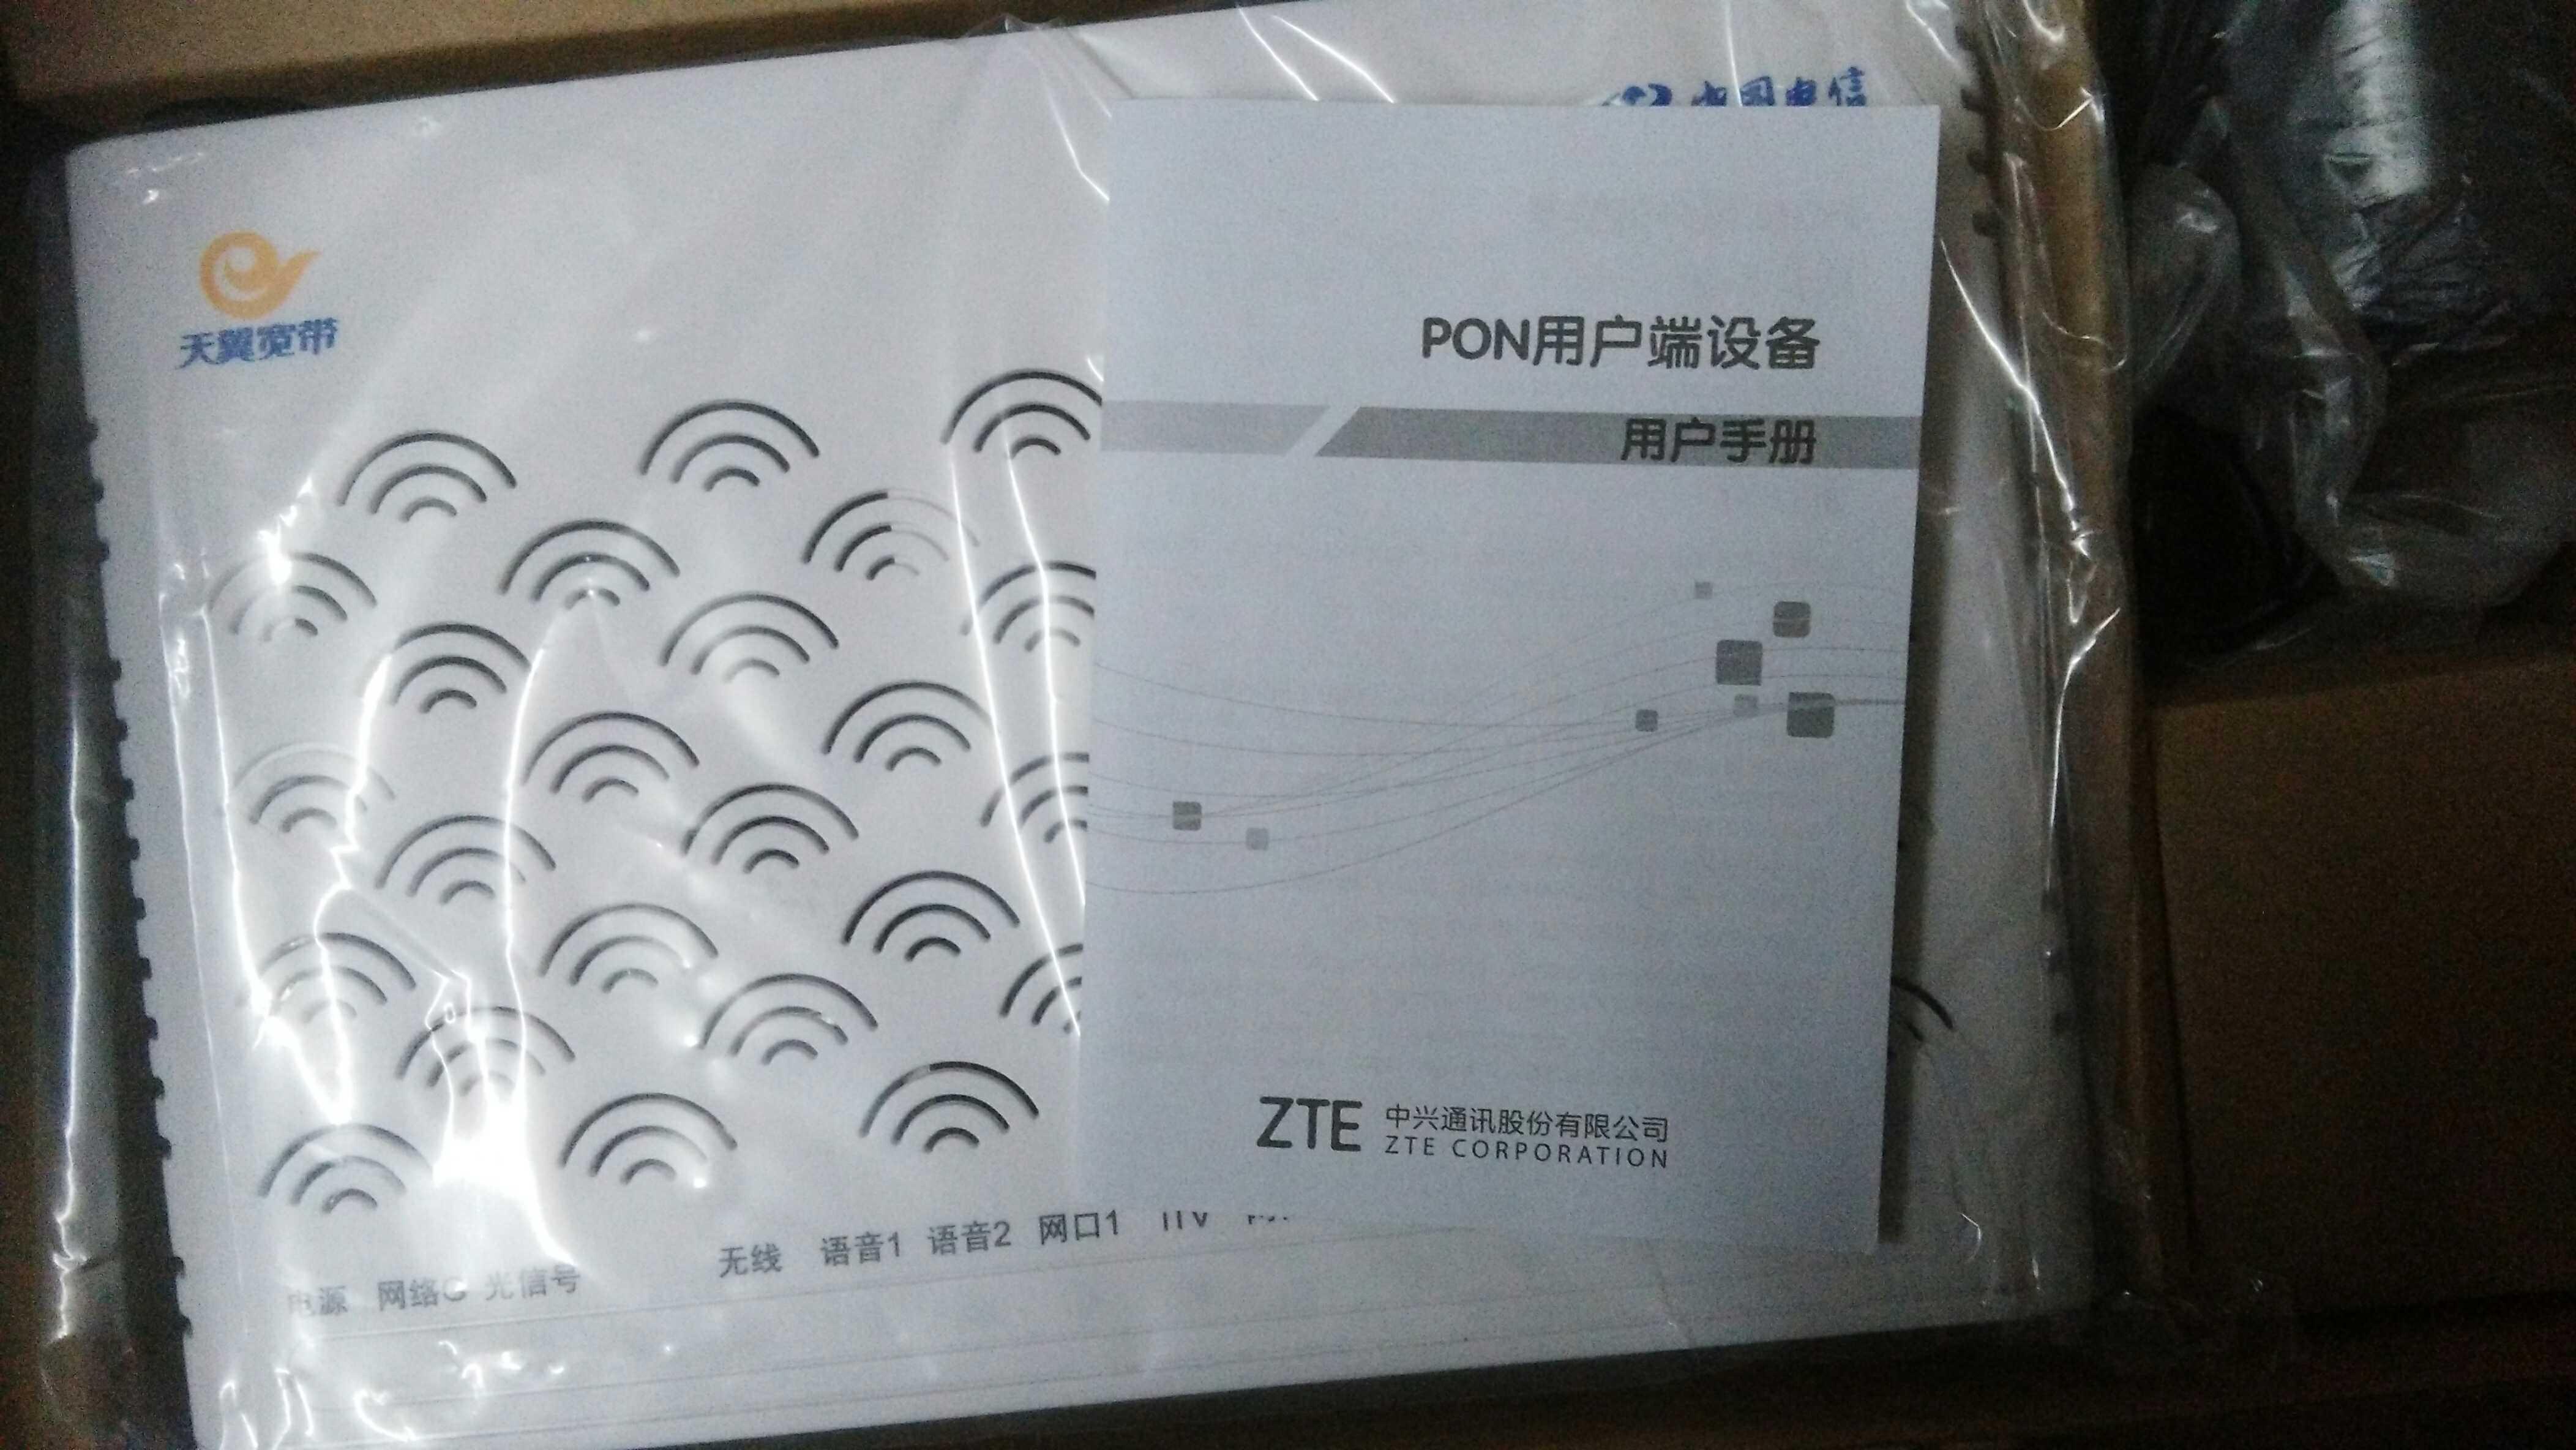 New Guangdong national telecom ZTE f660 gigabit light cat Cat 4 2gpon  built-in wireless Guangxi